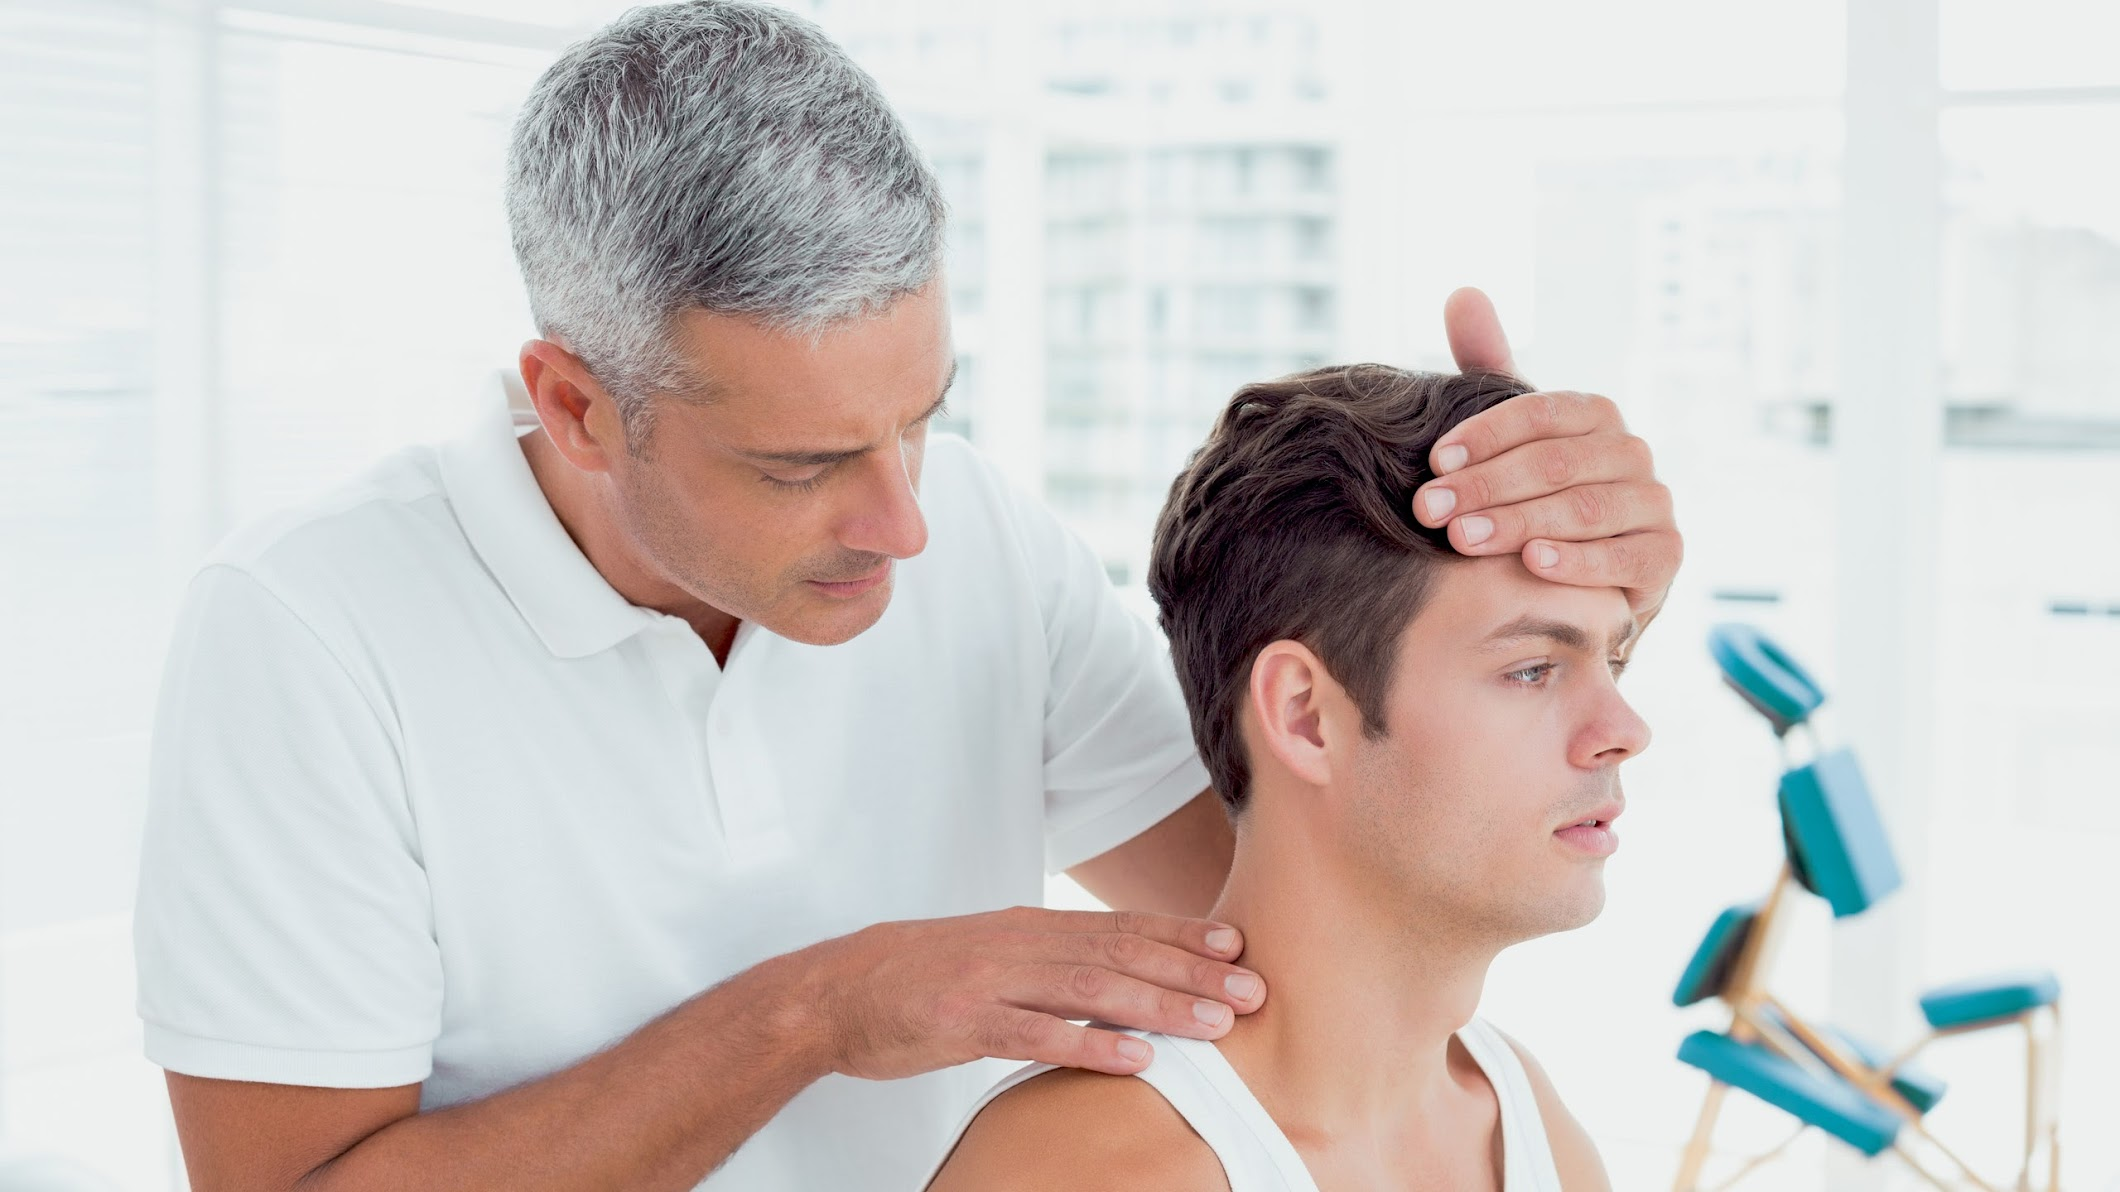 Bundesverband Osteopathie e. V